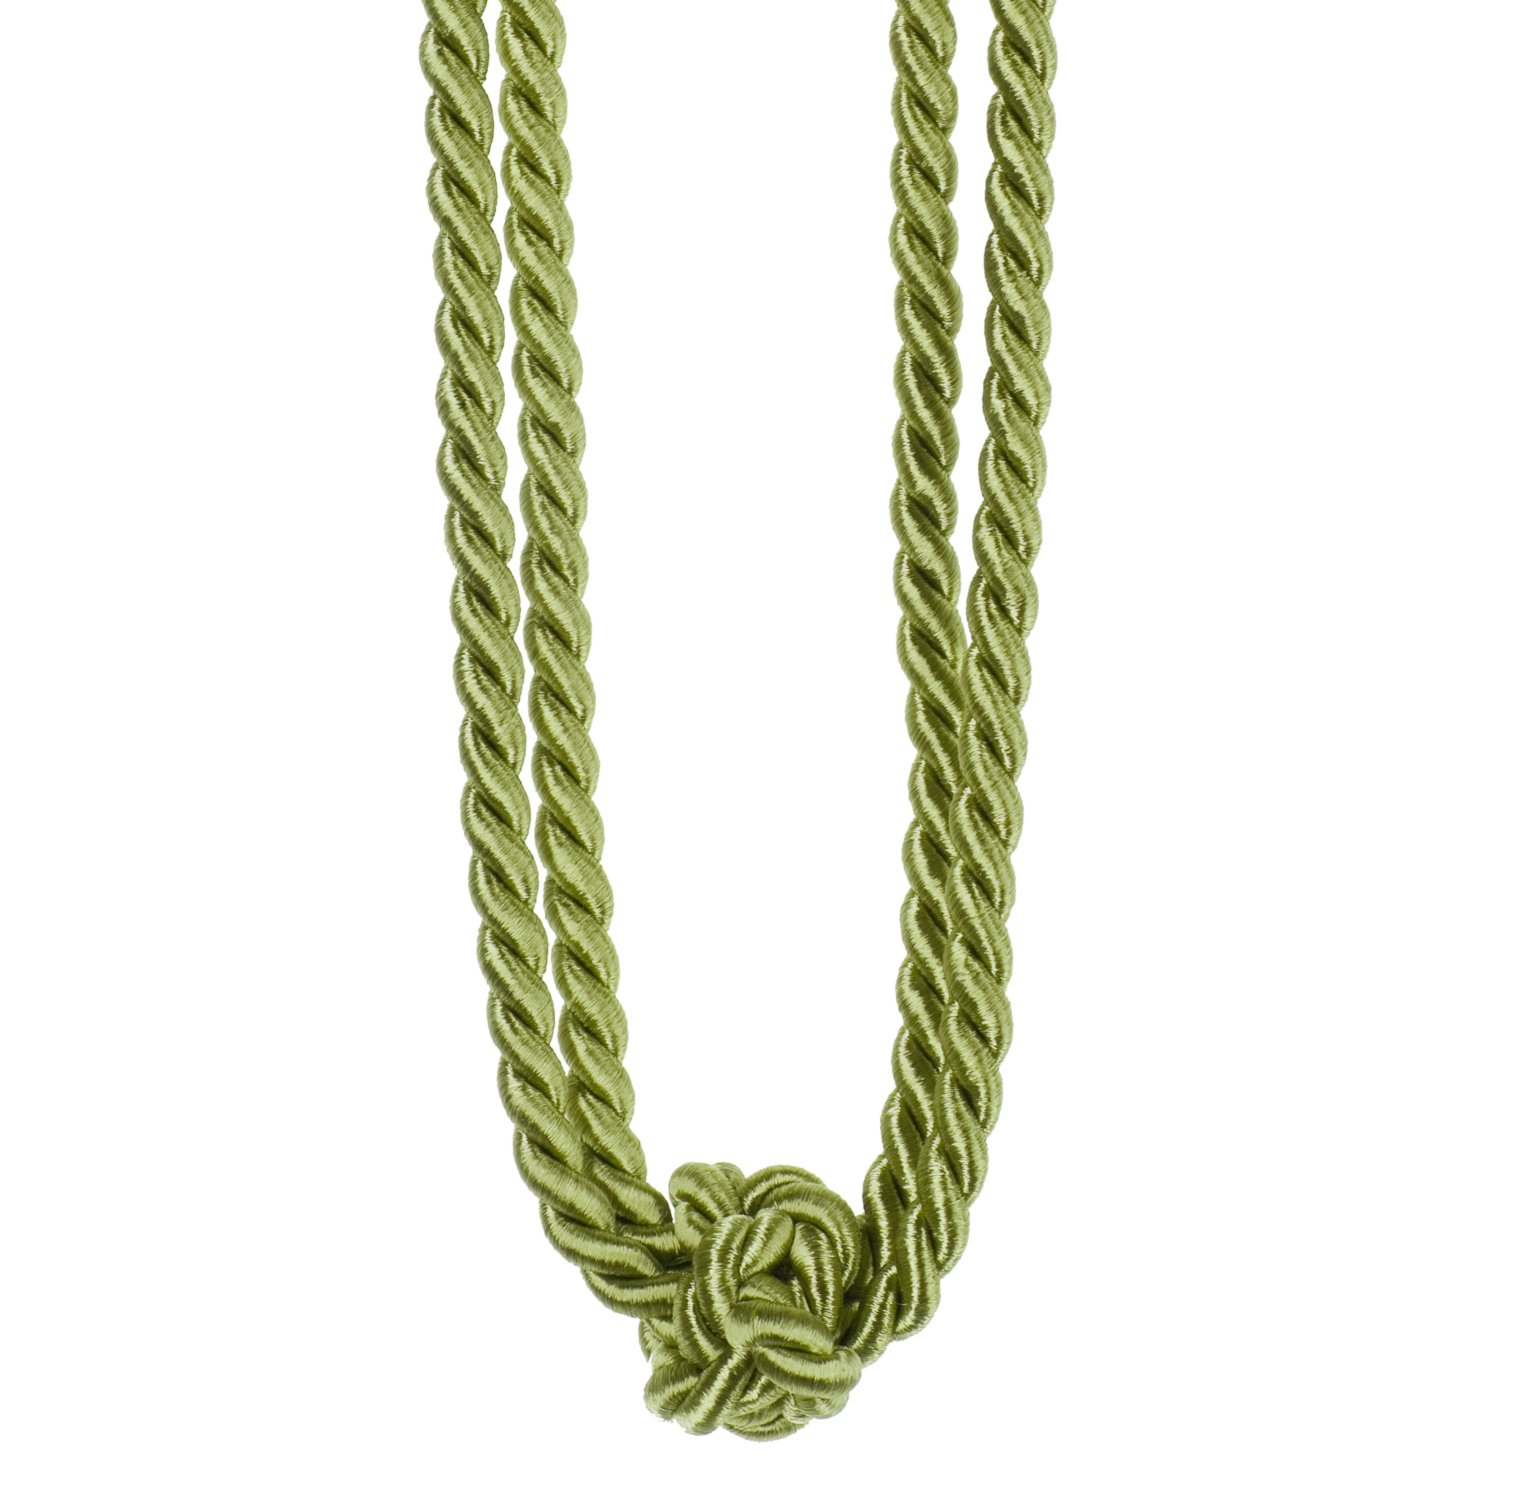 Raffhalter LUISA - mint - Zierknoten - 60 cm